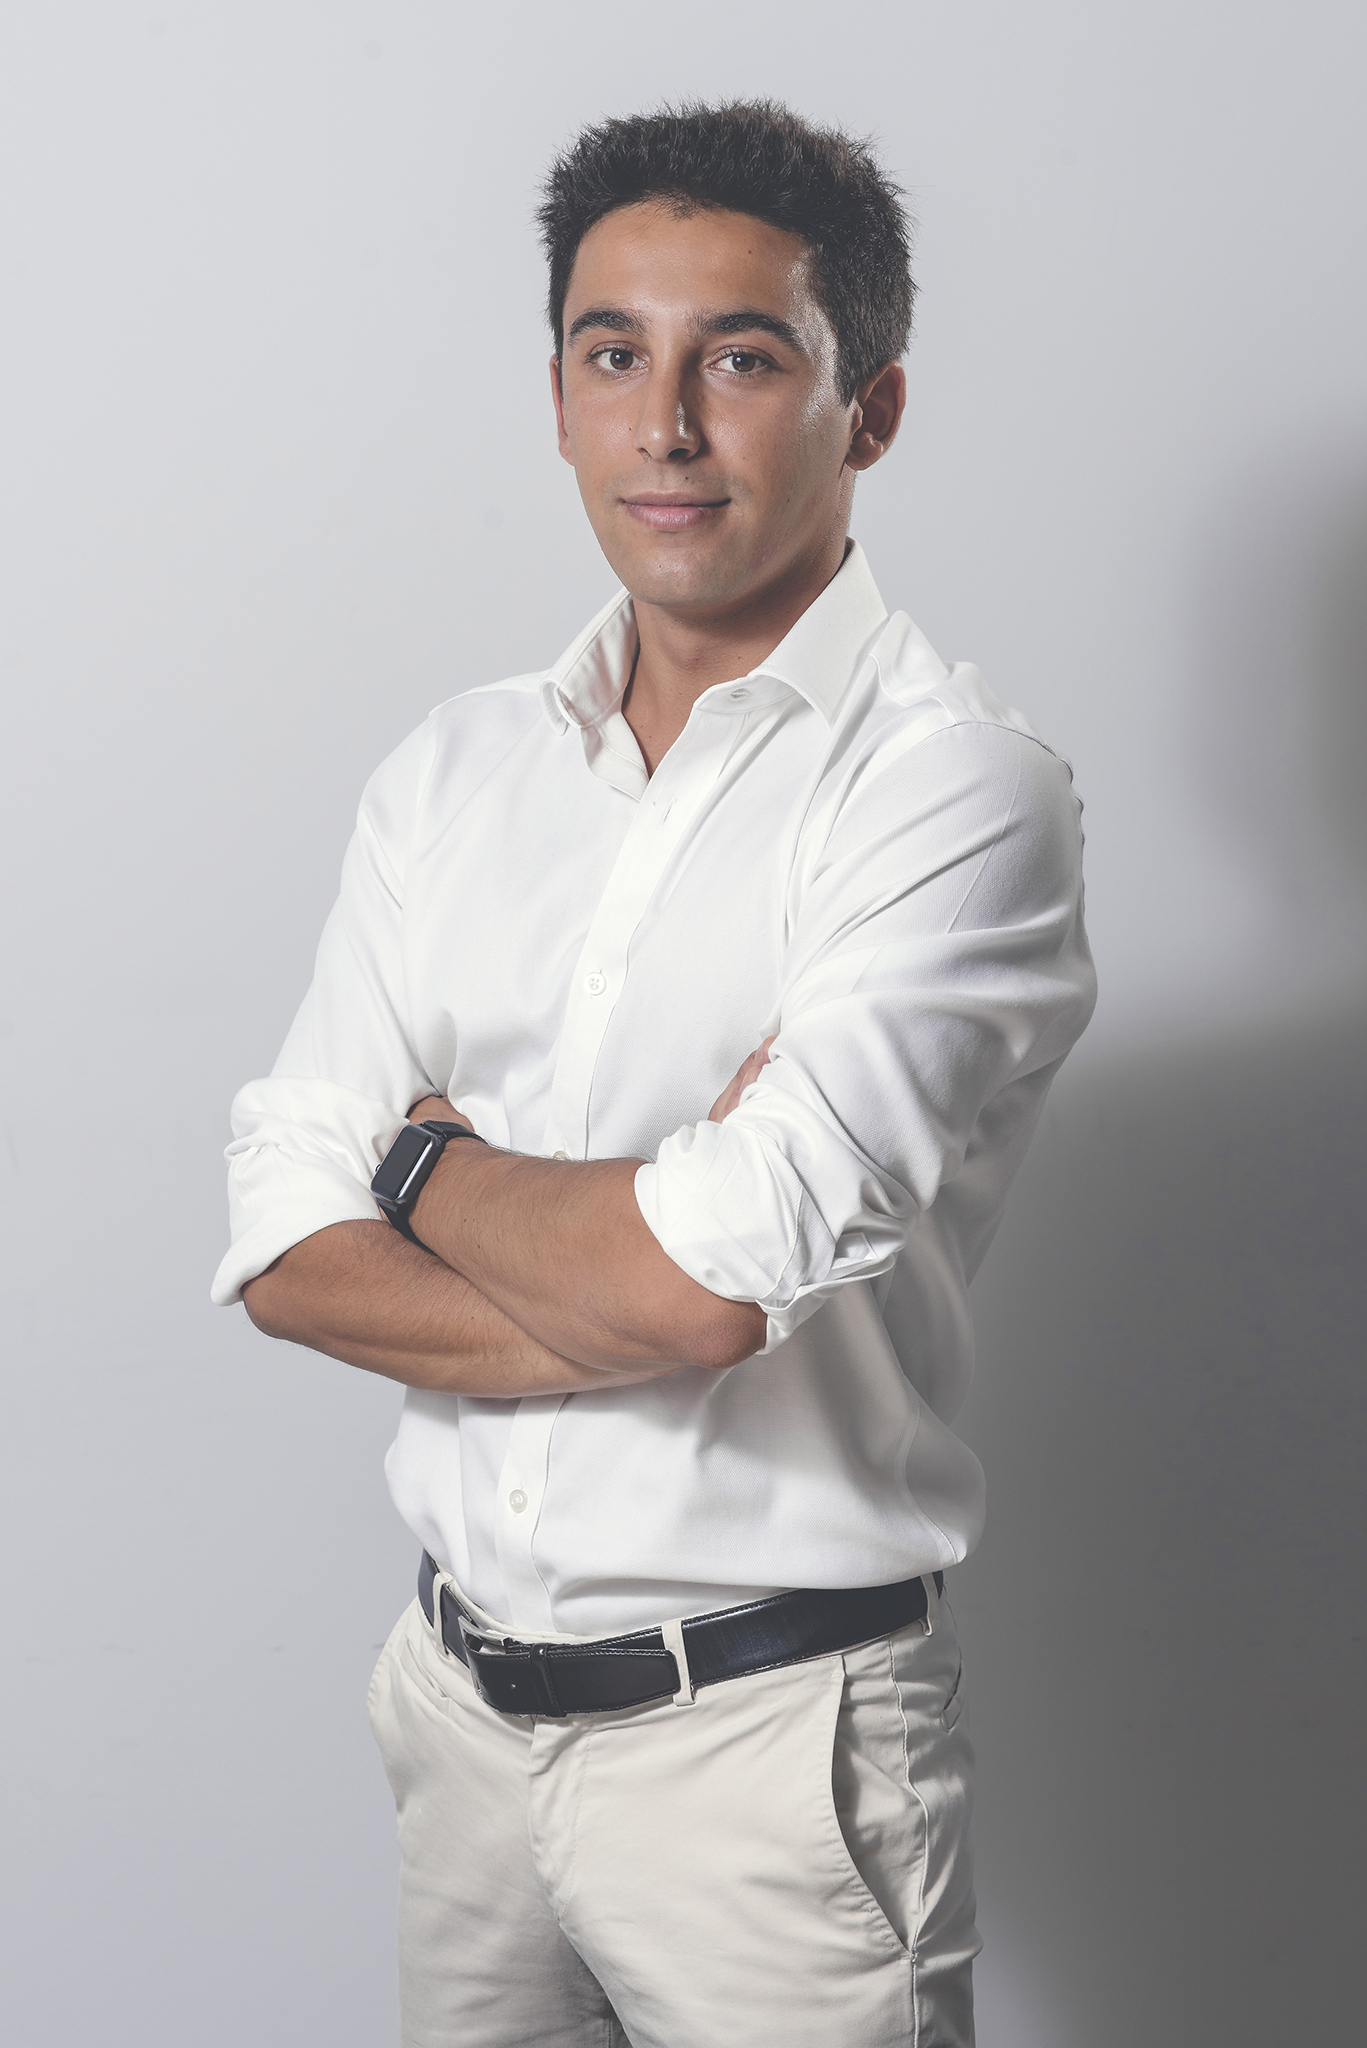 daniel cofounder addaps